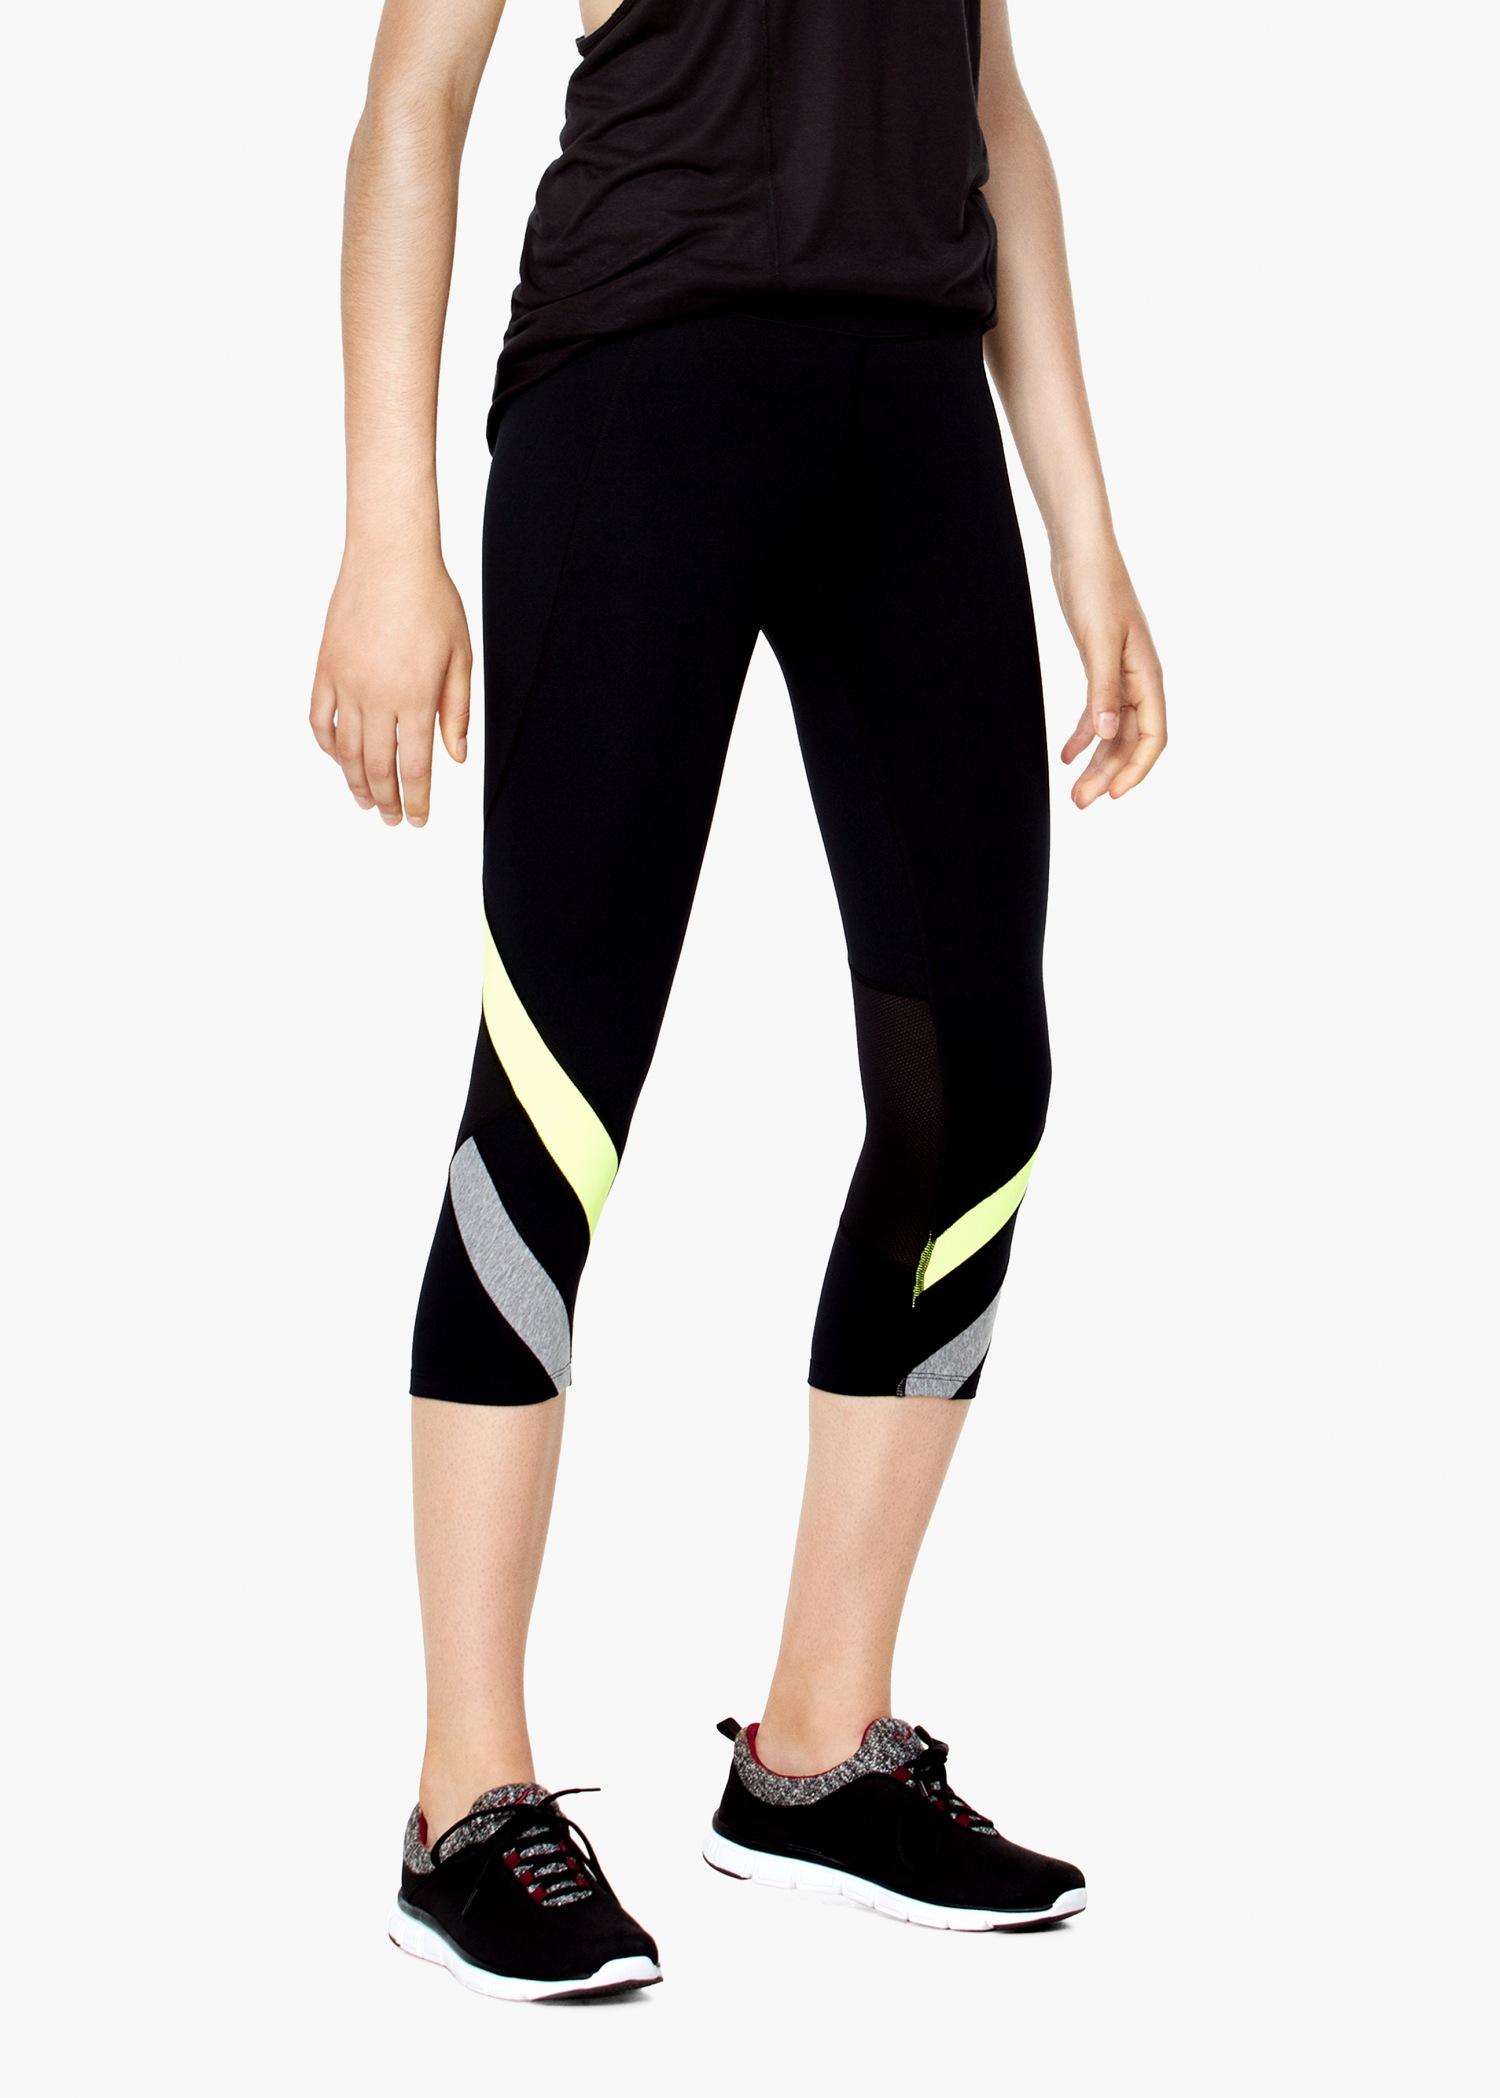 Lyst - Mango Fitness & Running